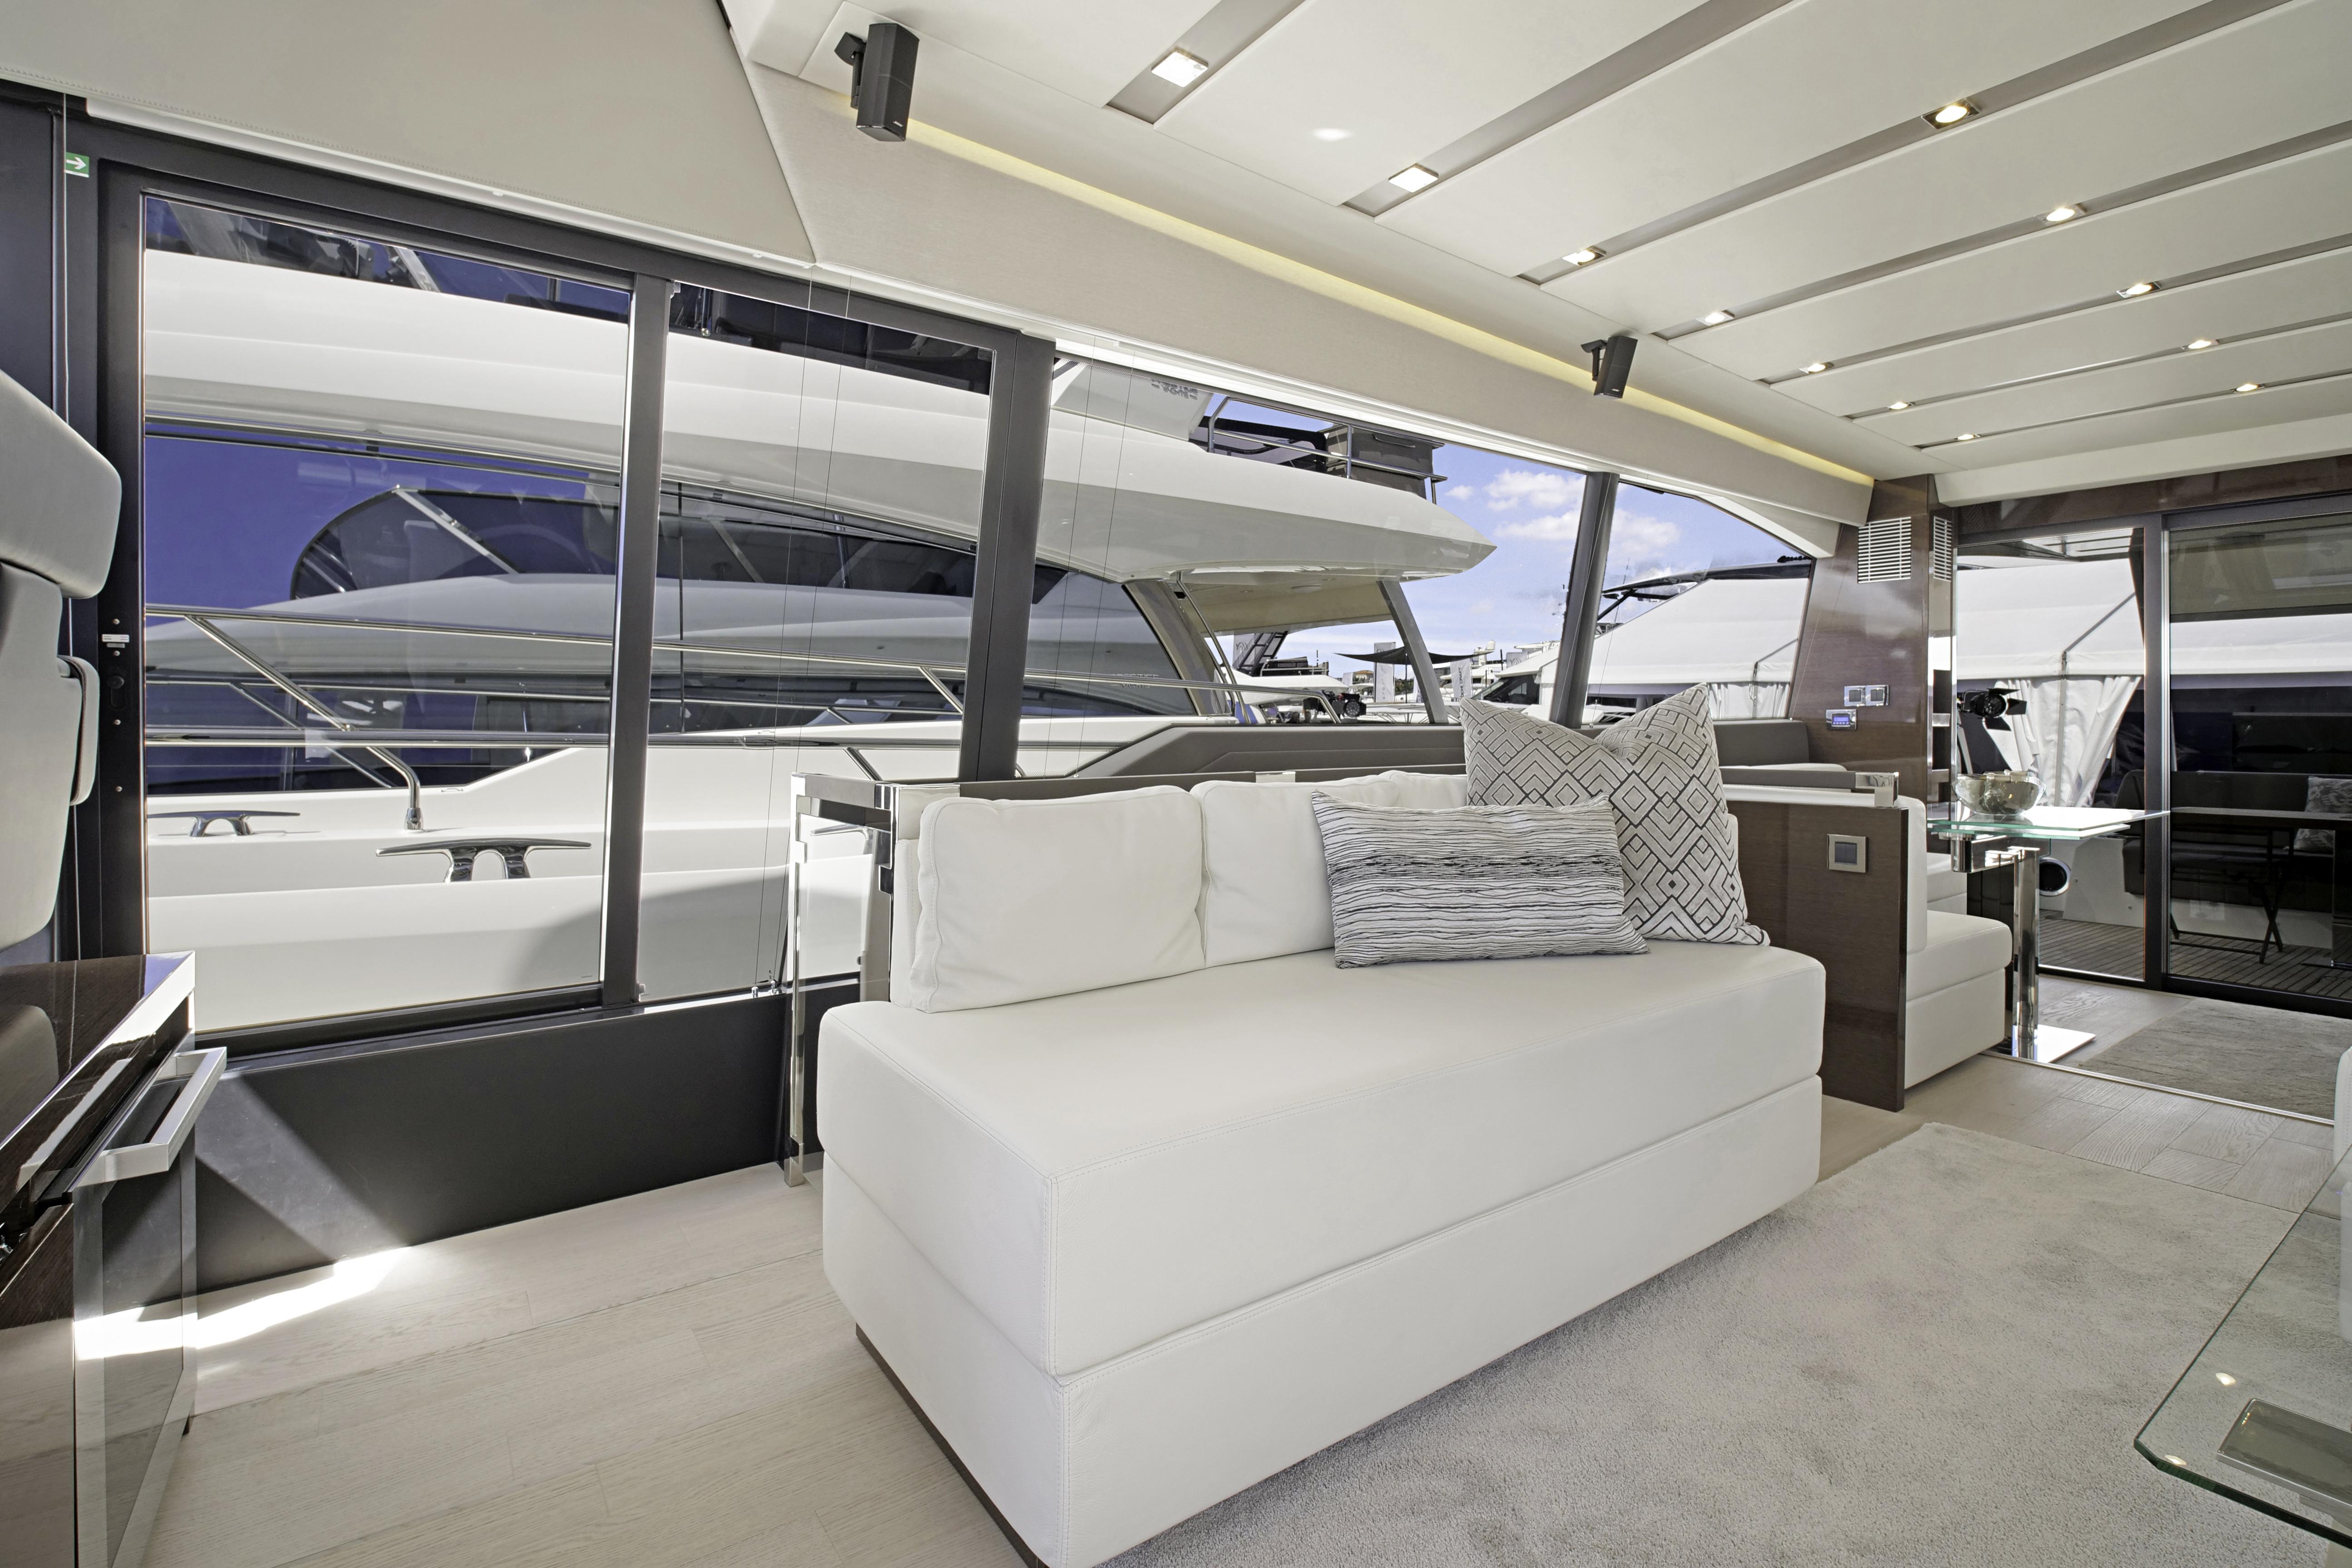 Prestige-680-High-Gloss---3-Bernard_Dino_Bonomo